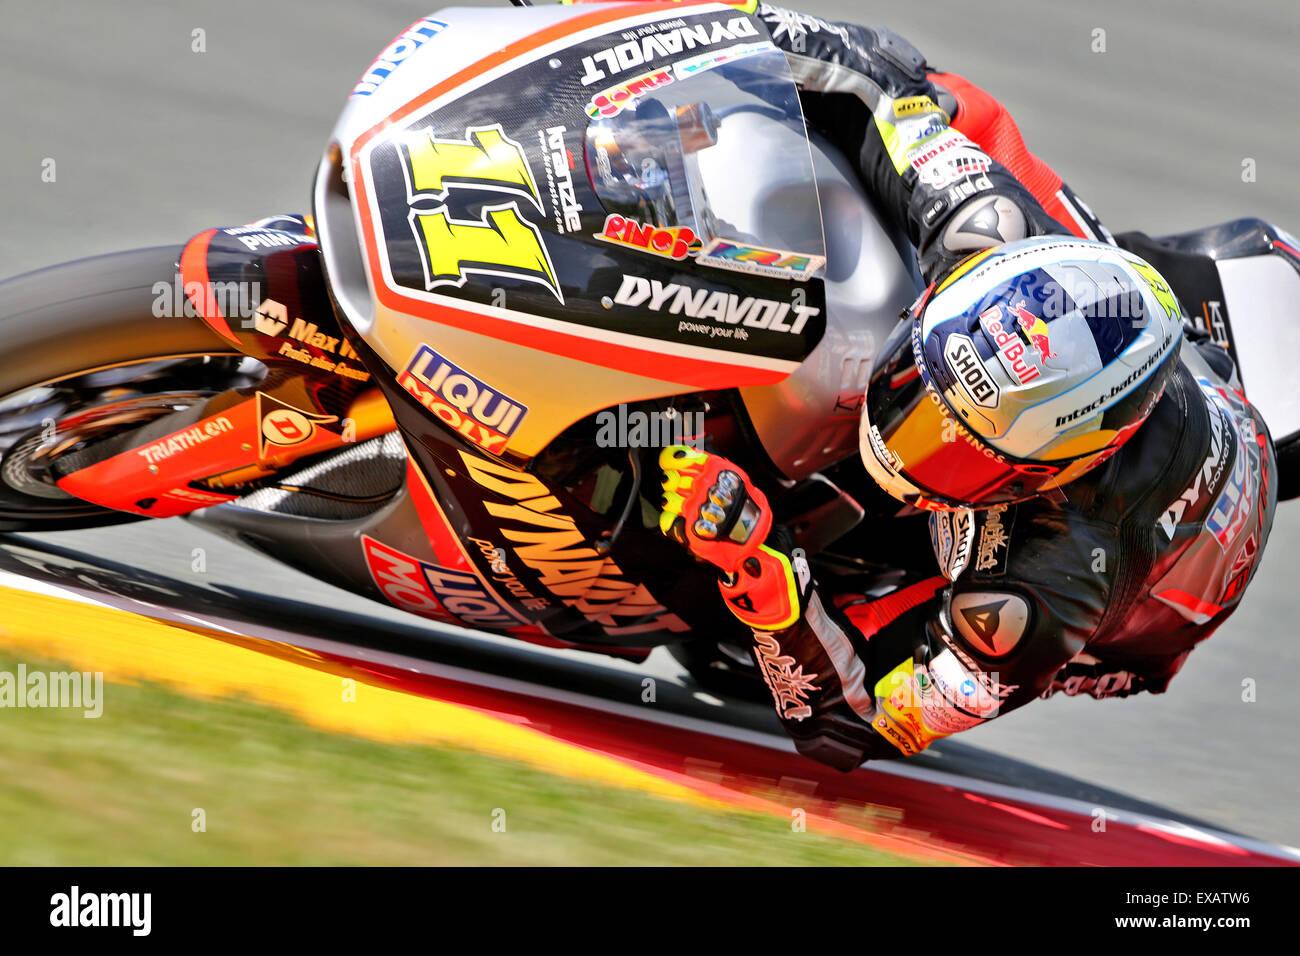 Hohenstein-Ernstthal, Allemagne. 10 juillet, 2015. L'allemand Sandro Cortese Moto2 rider du Team Dynavolt Intact Photo Stock